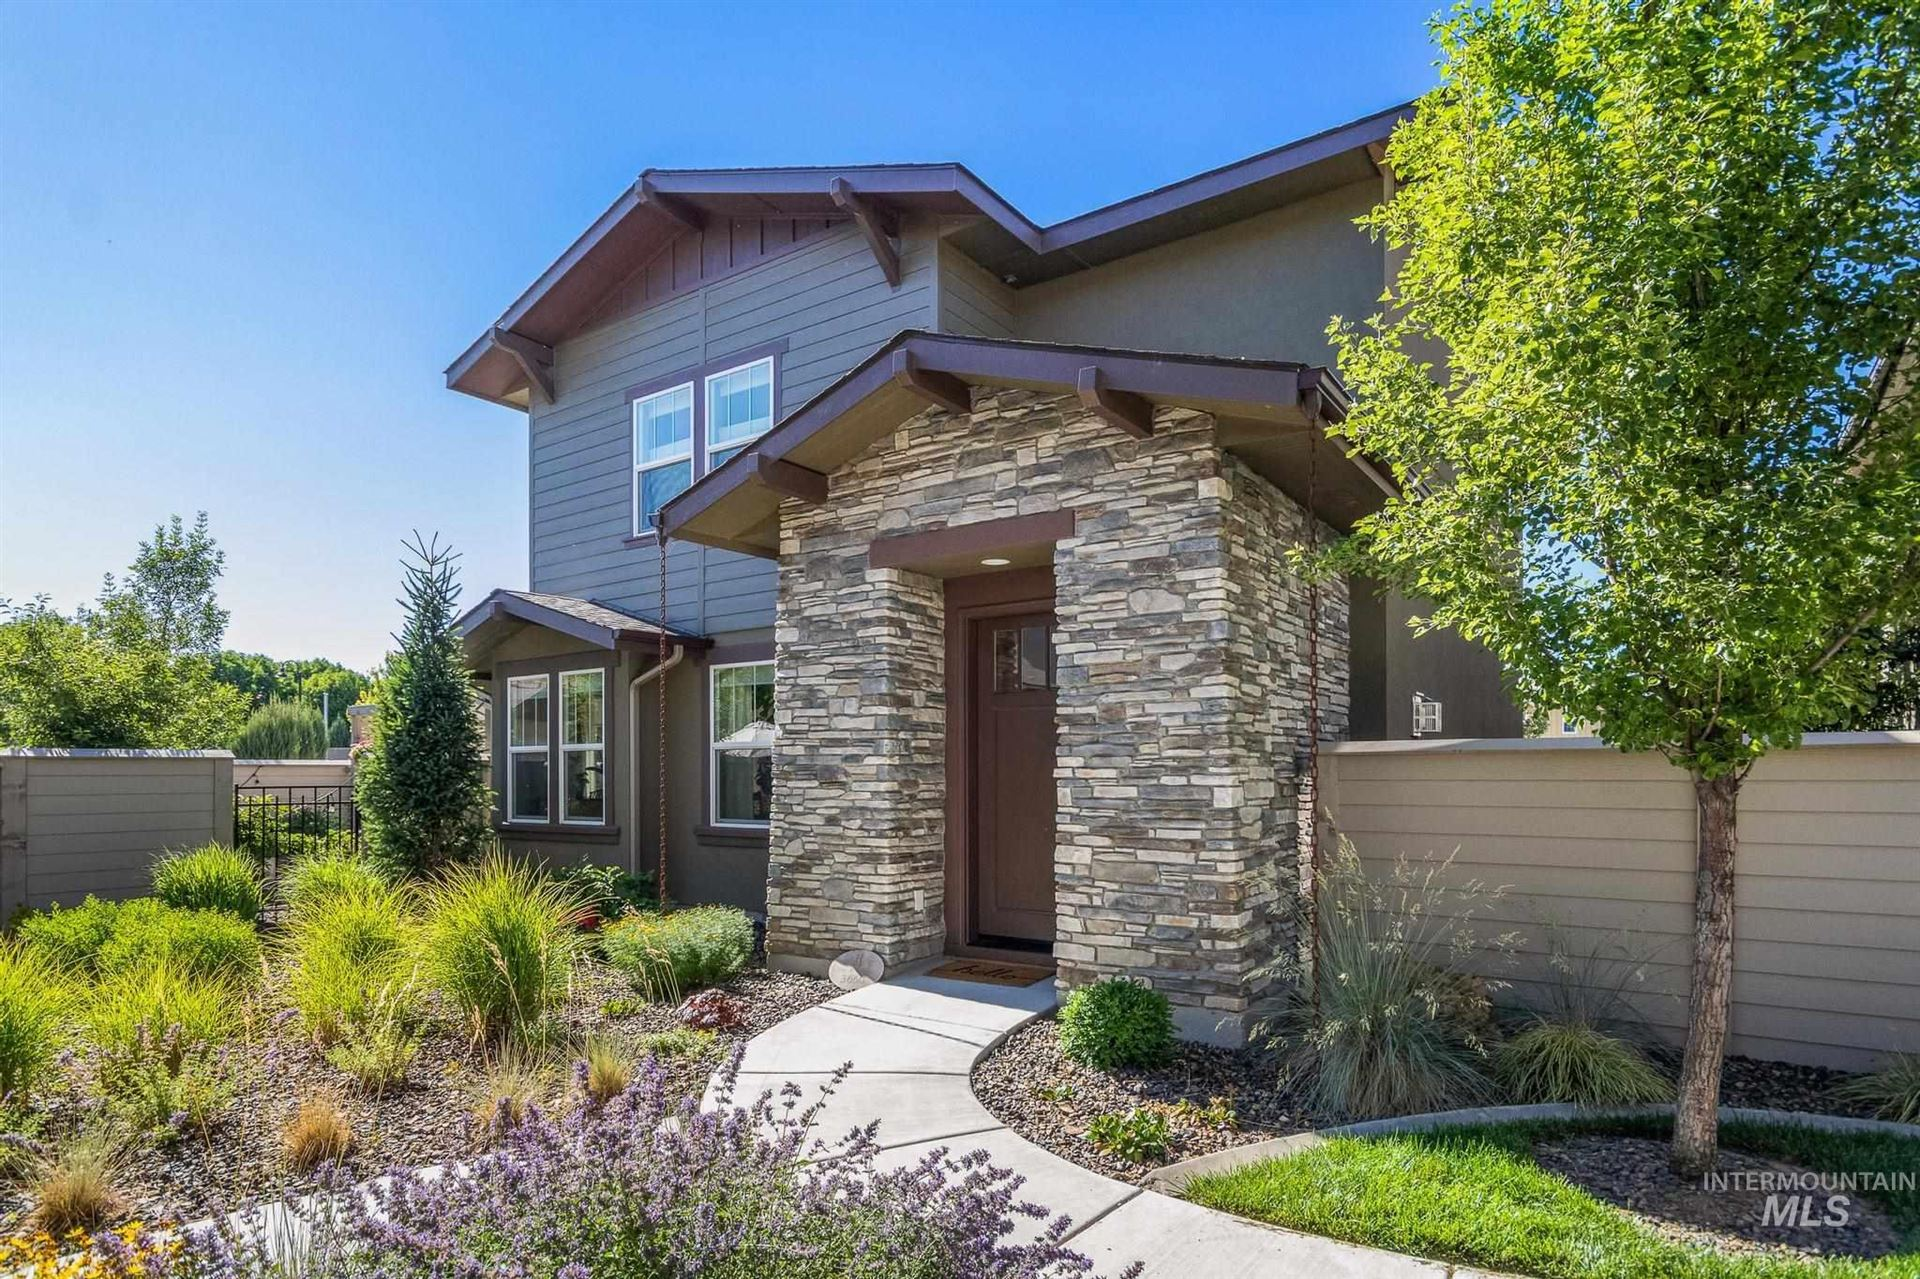 3660 S Pheasant Tail Way, Boise, ID 83716 - MLS#: 98807222